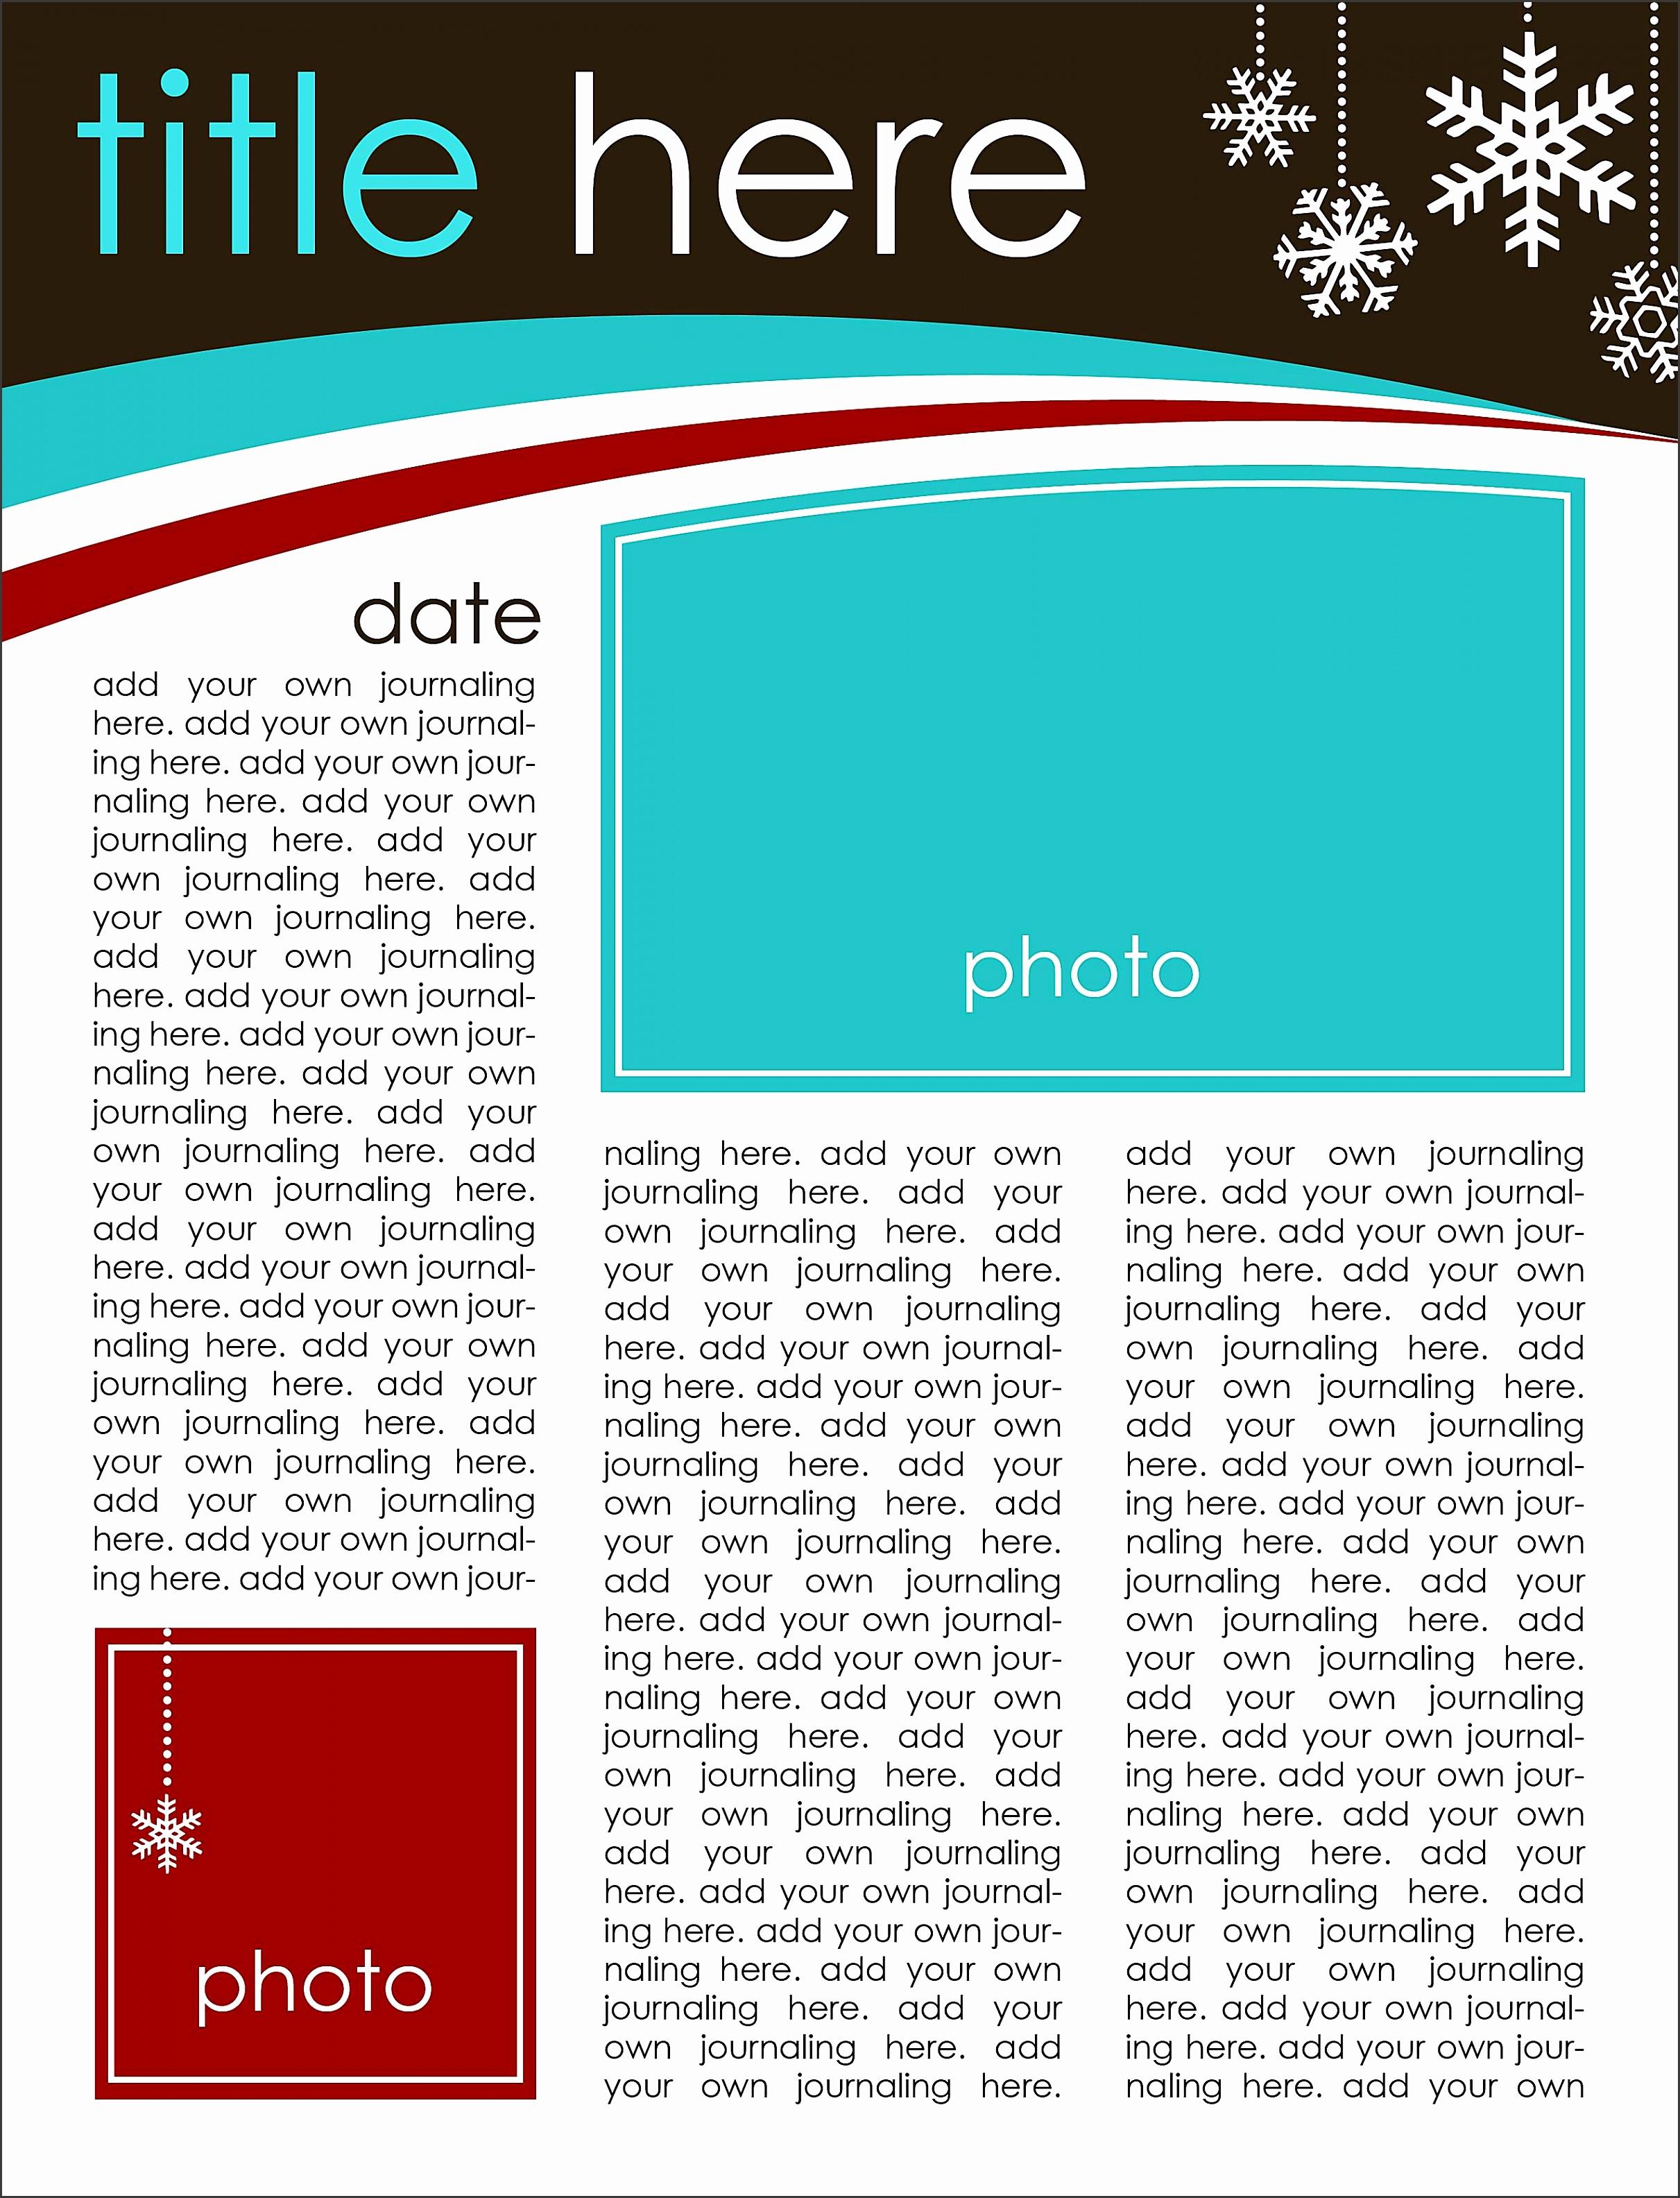 creating keepsakes free christmas newsletter templates 579bcb365f9b589aa96e41a9